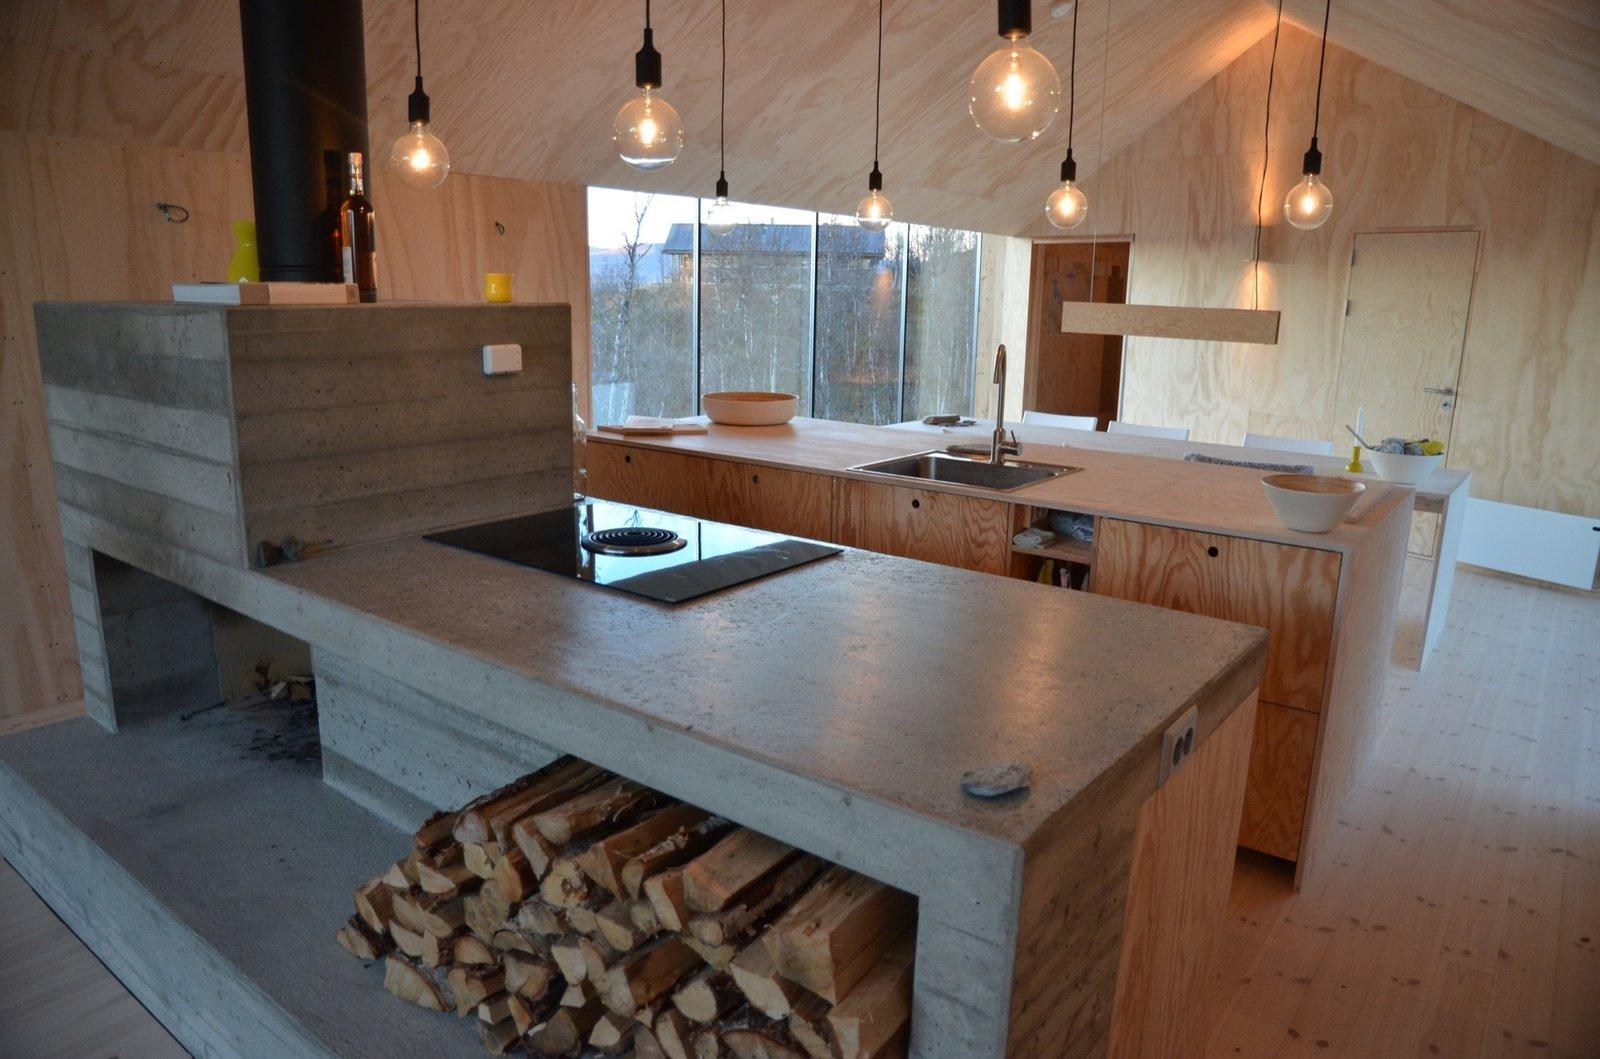 Kitchen and Concrete Counter  Kitchen